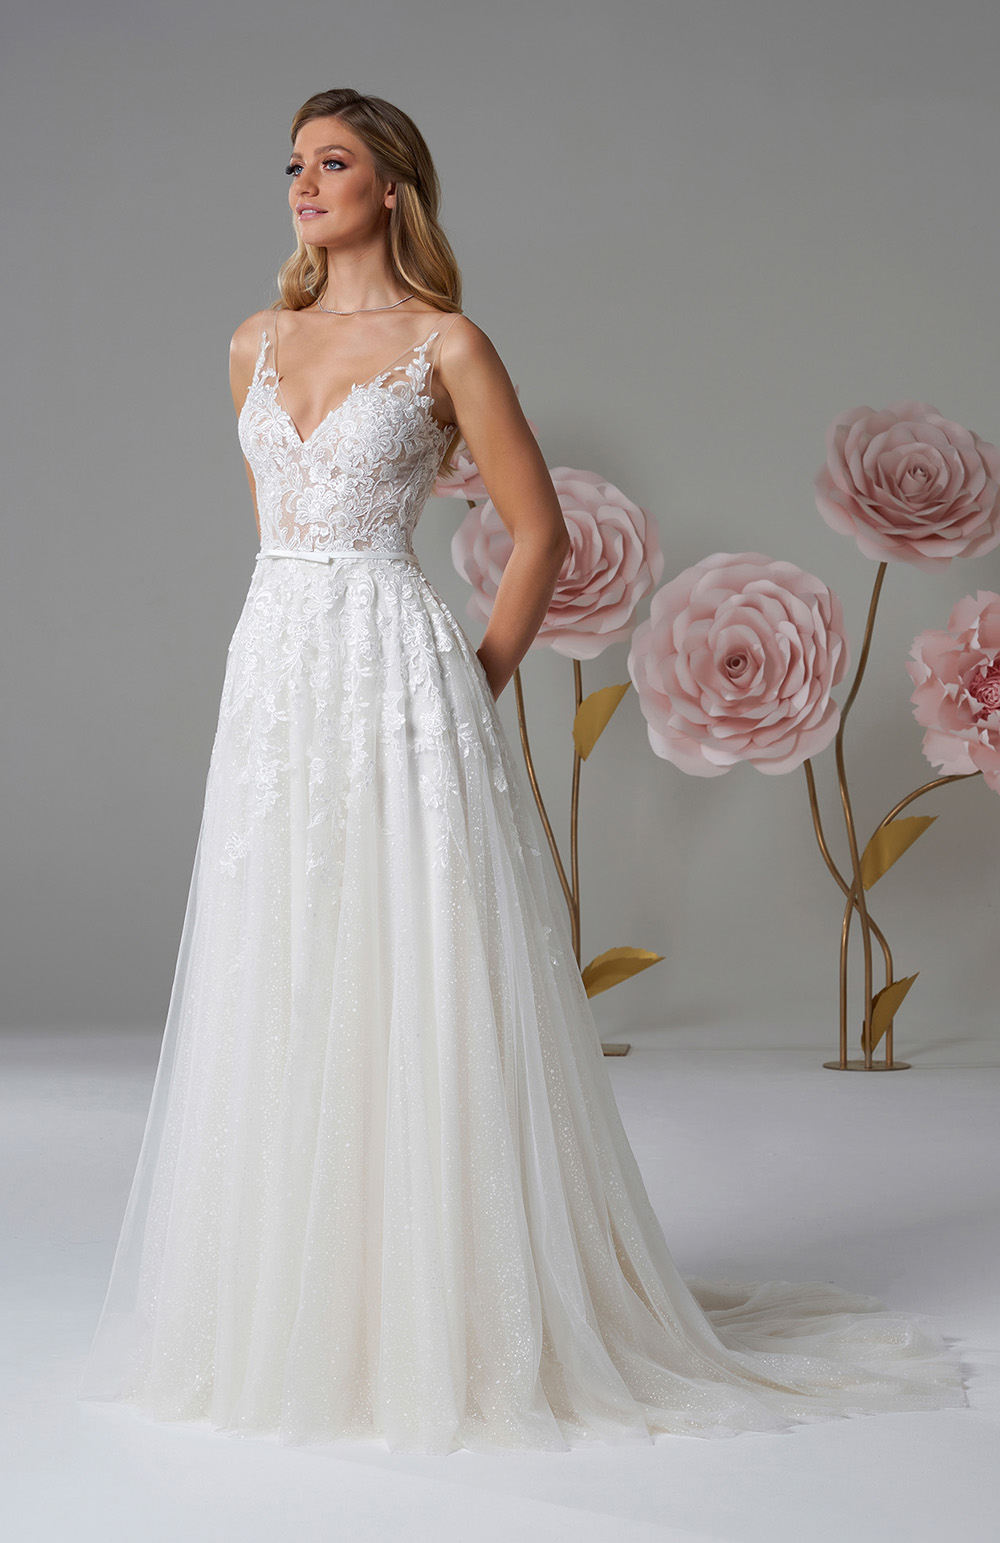 Robe de mariée Modèle Isao